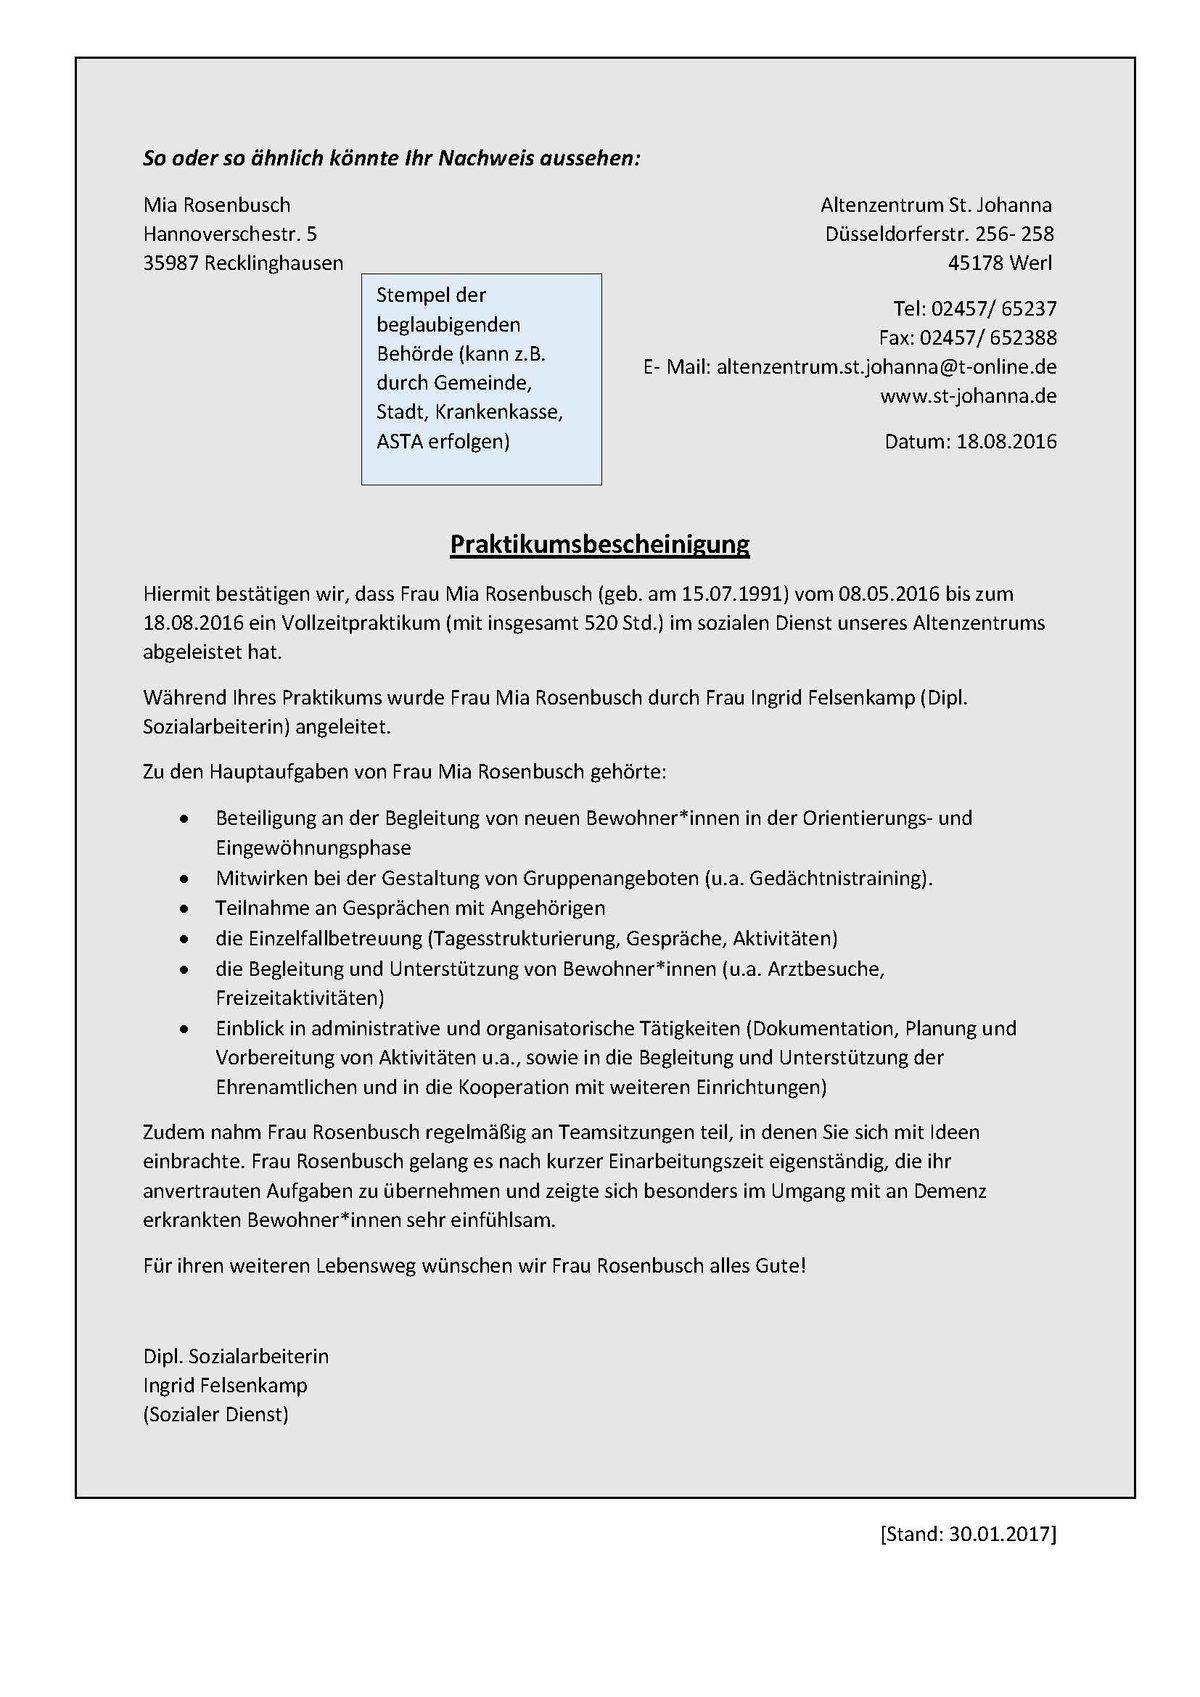 Praktikumszeugnis Muster Formulierungen Bewerbung Co 1